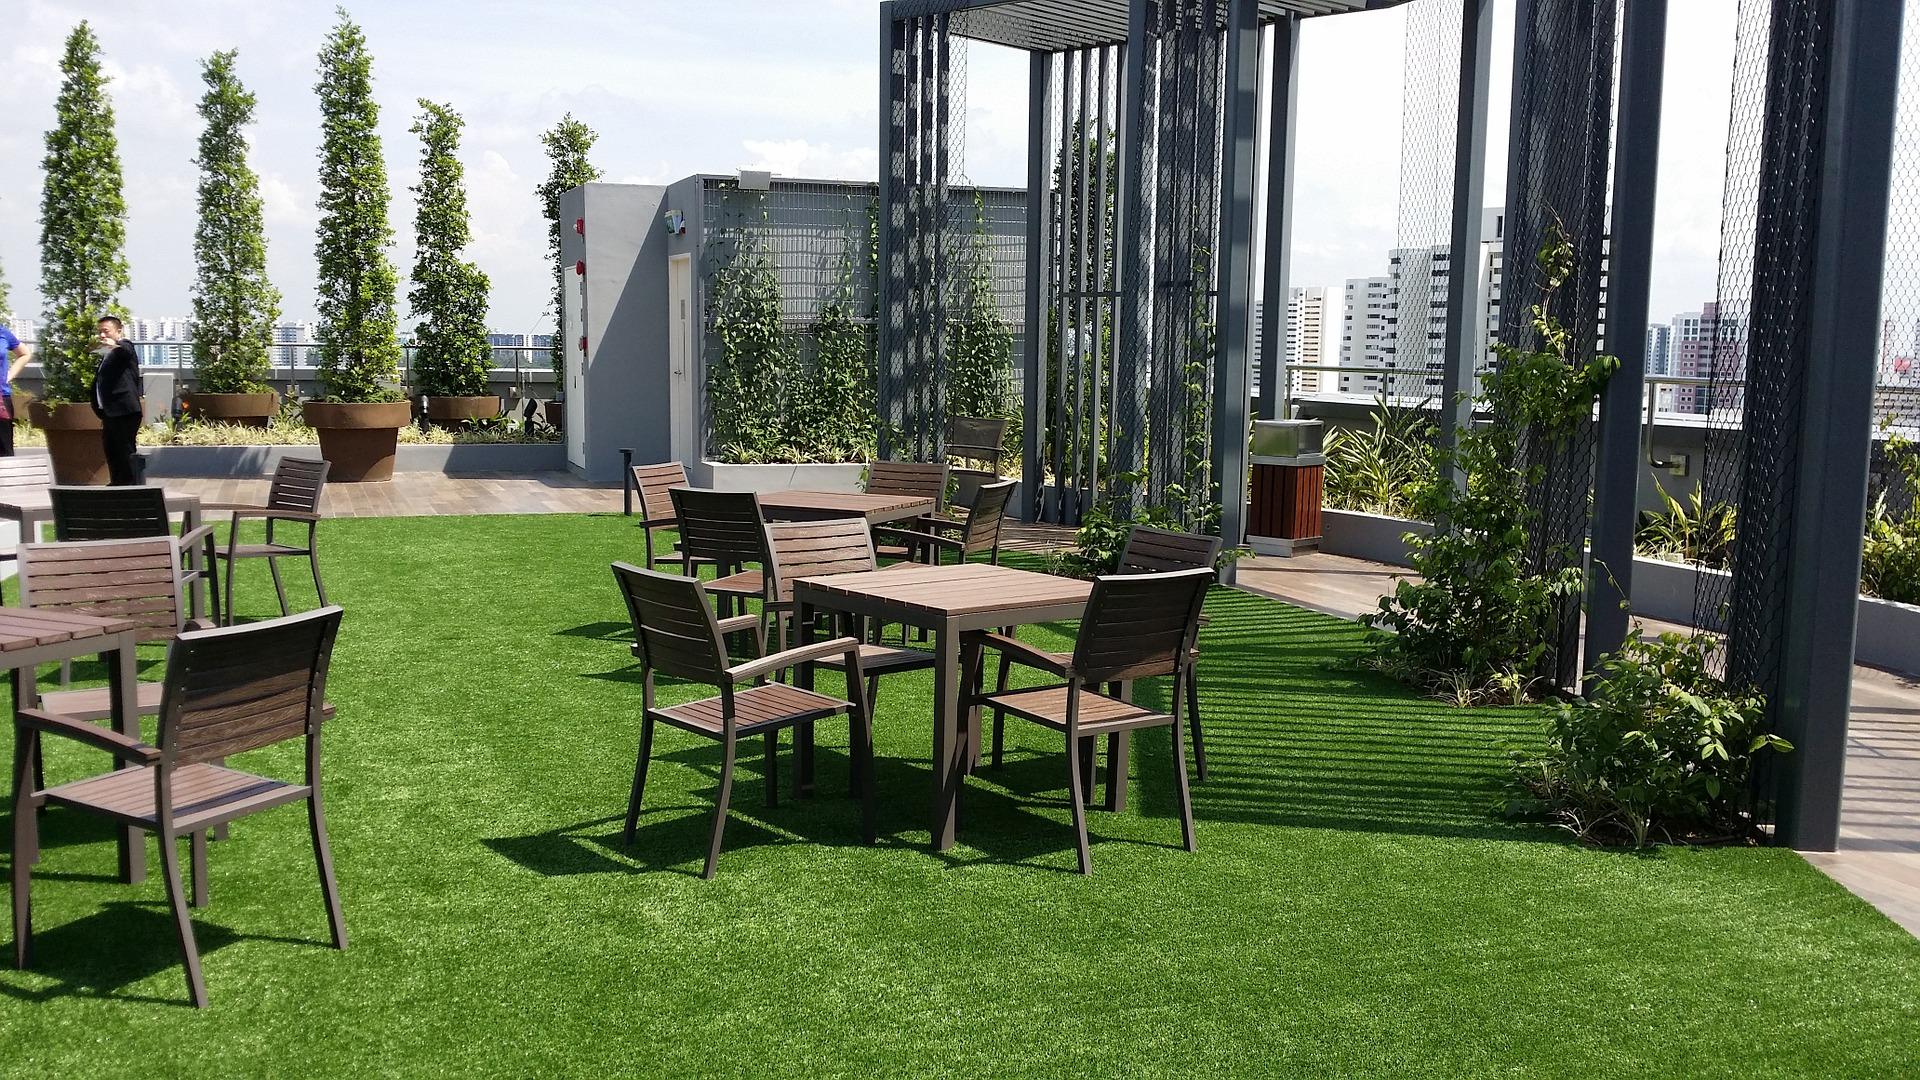 Le toit terrasse une plus value immobili re v immo for Toit terrasse immobilier